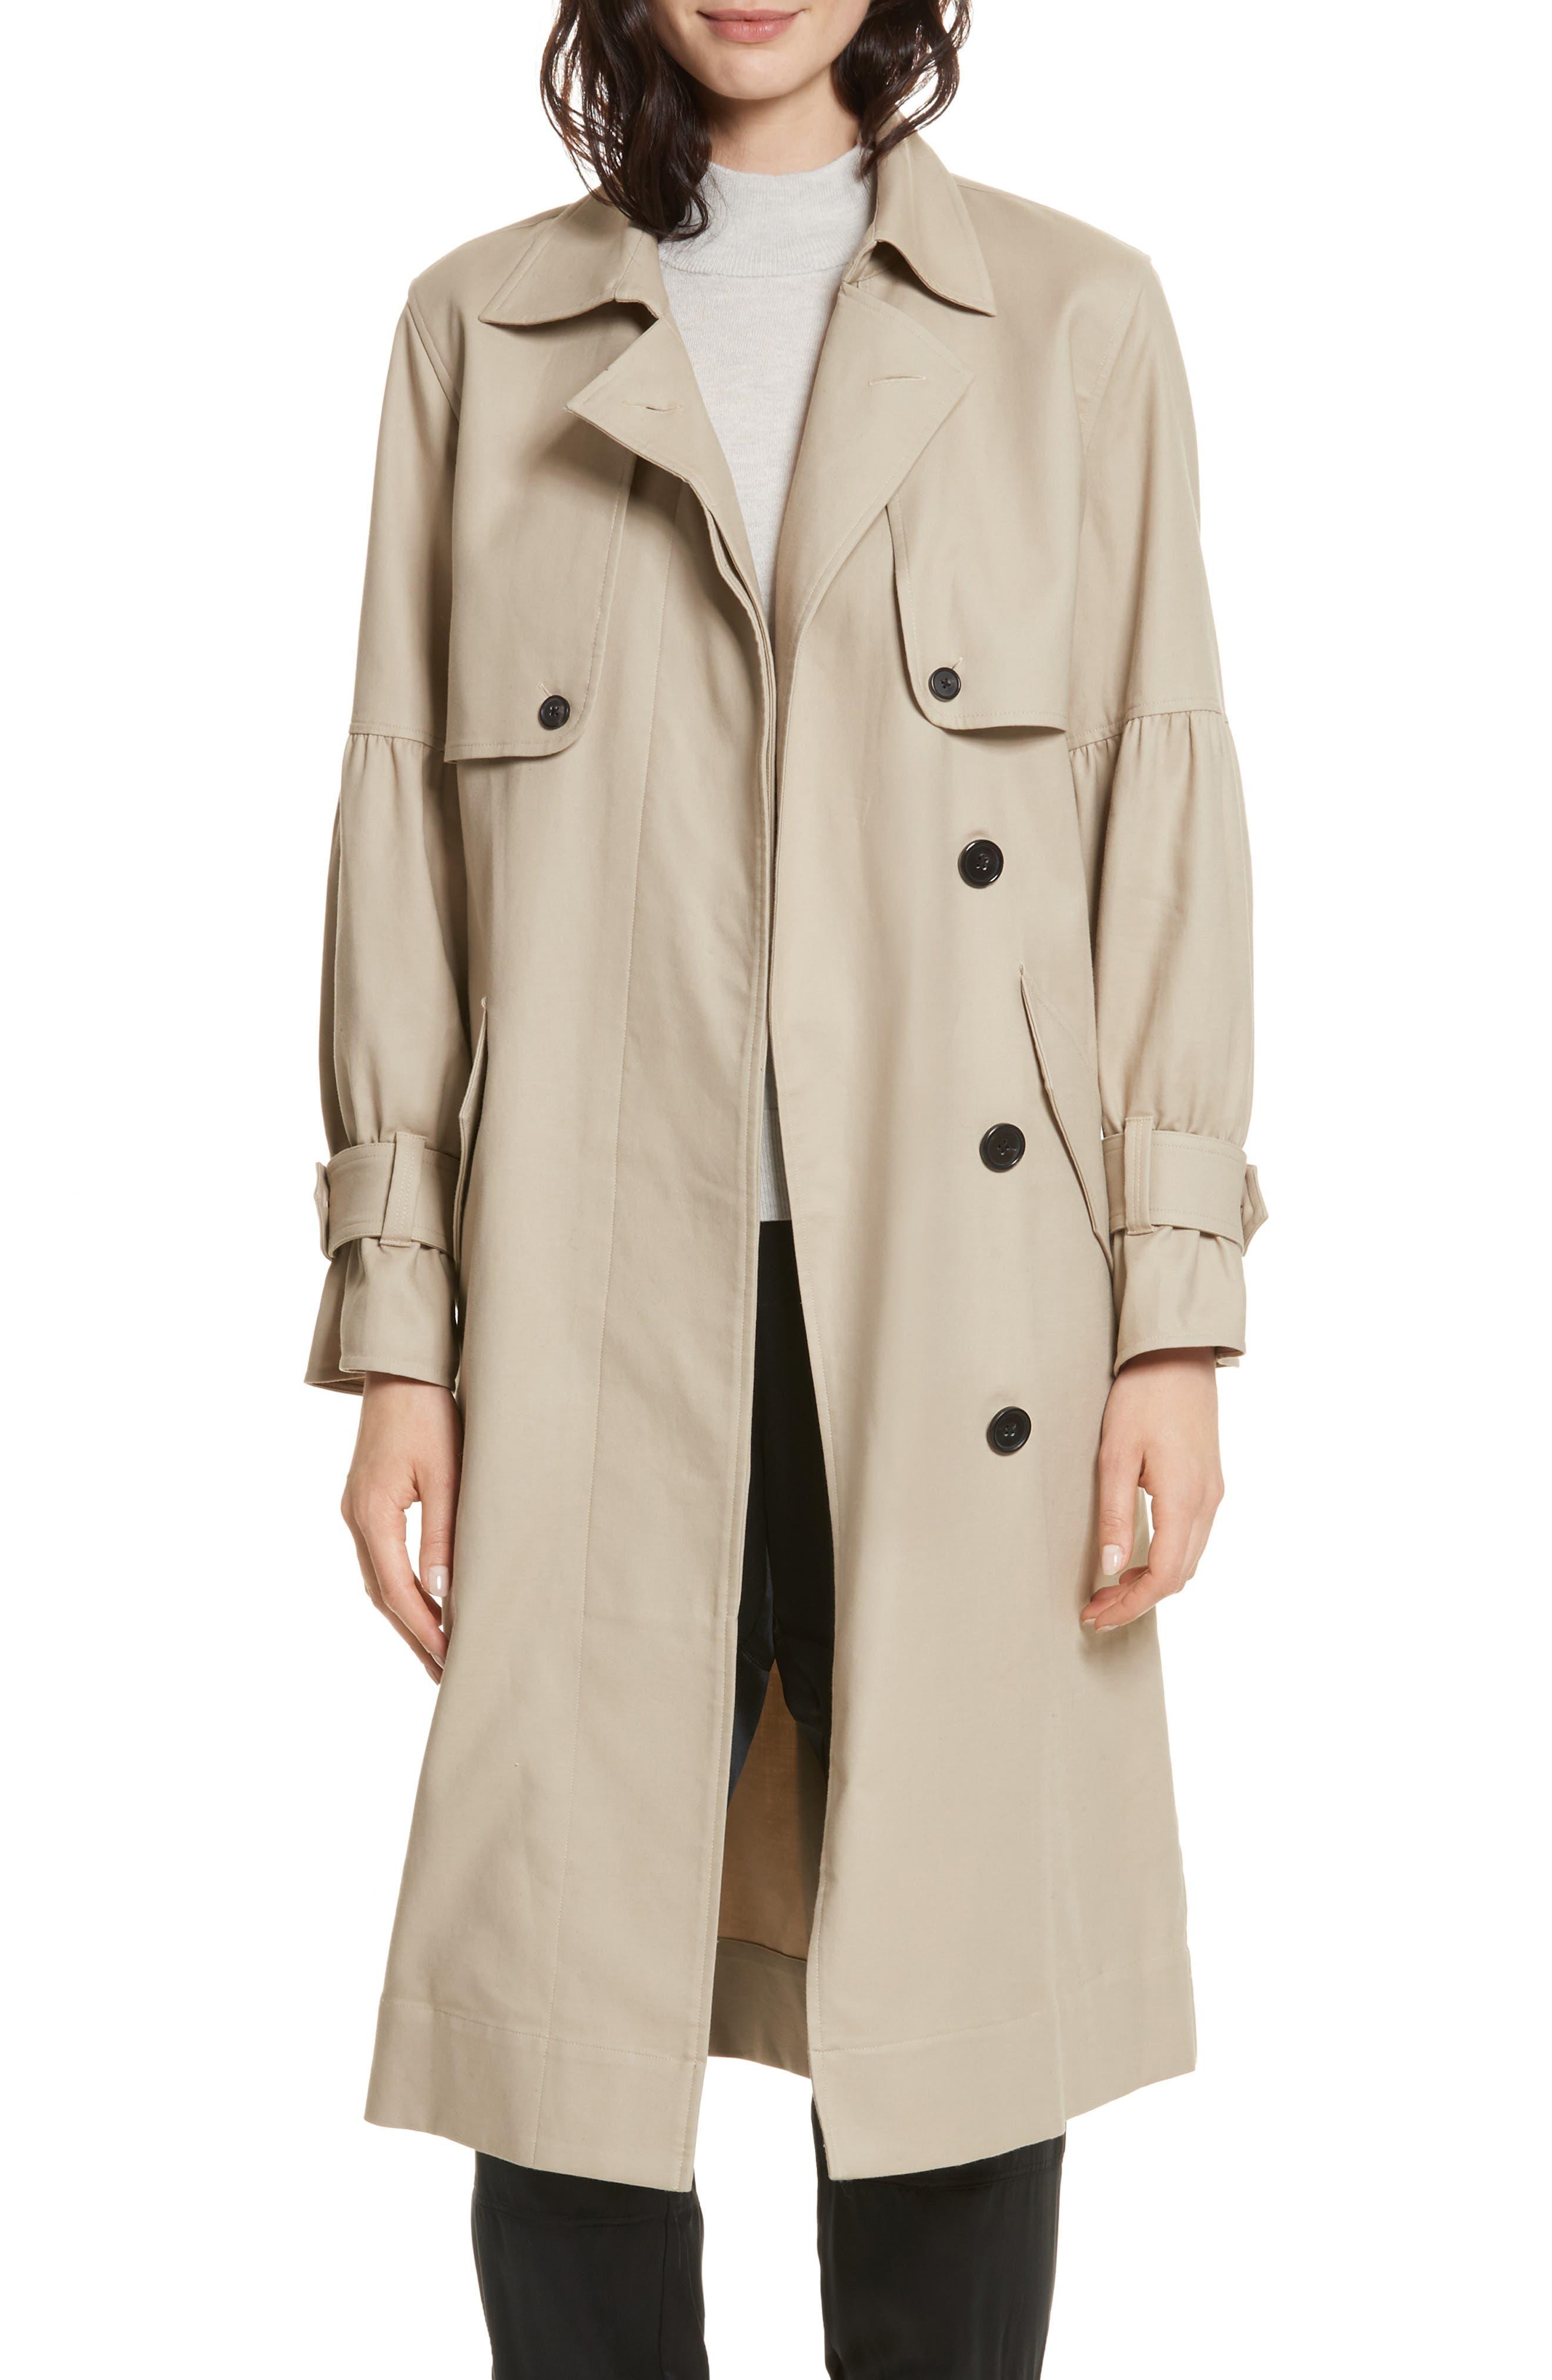 Alwena Cotton Trench Coat,                         Main,                         color, 250